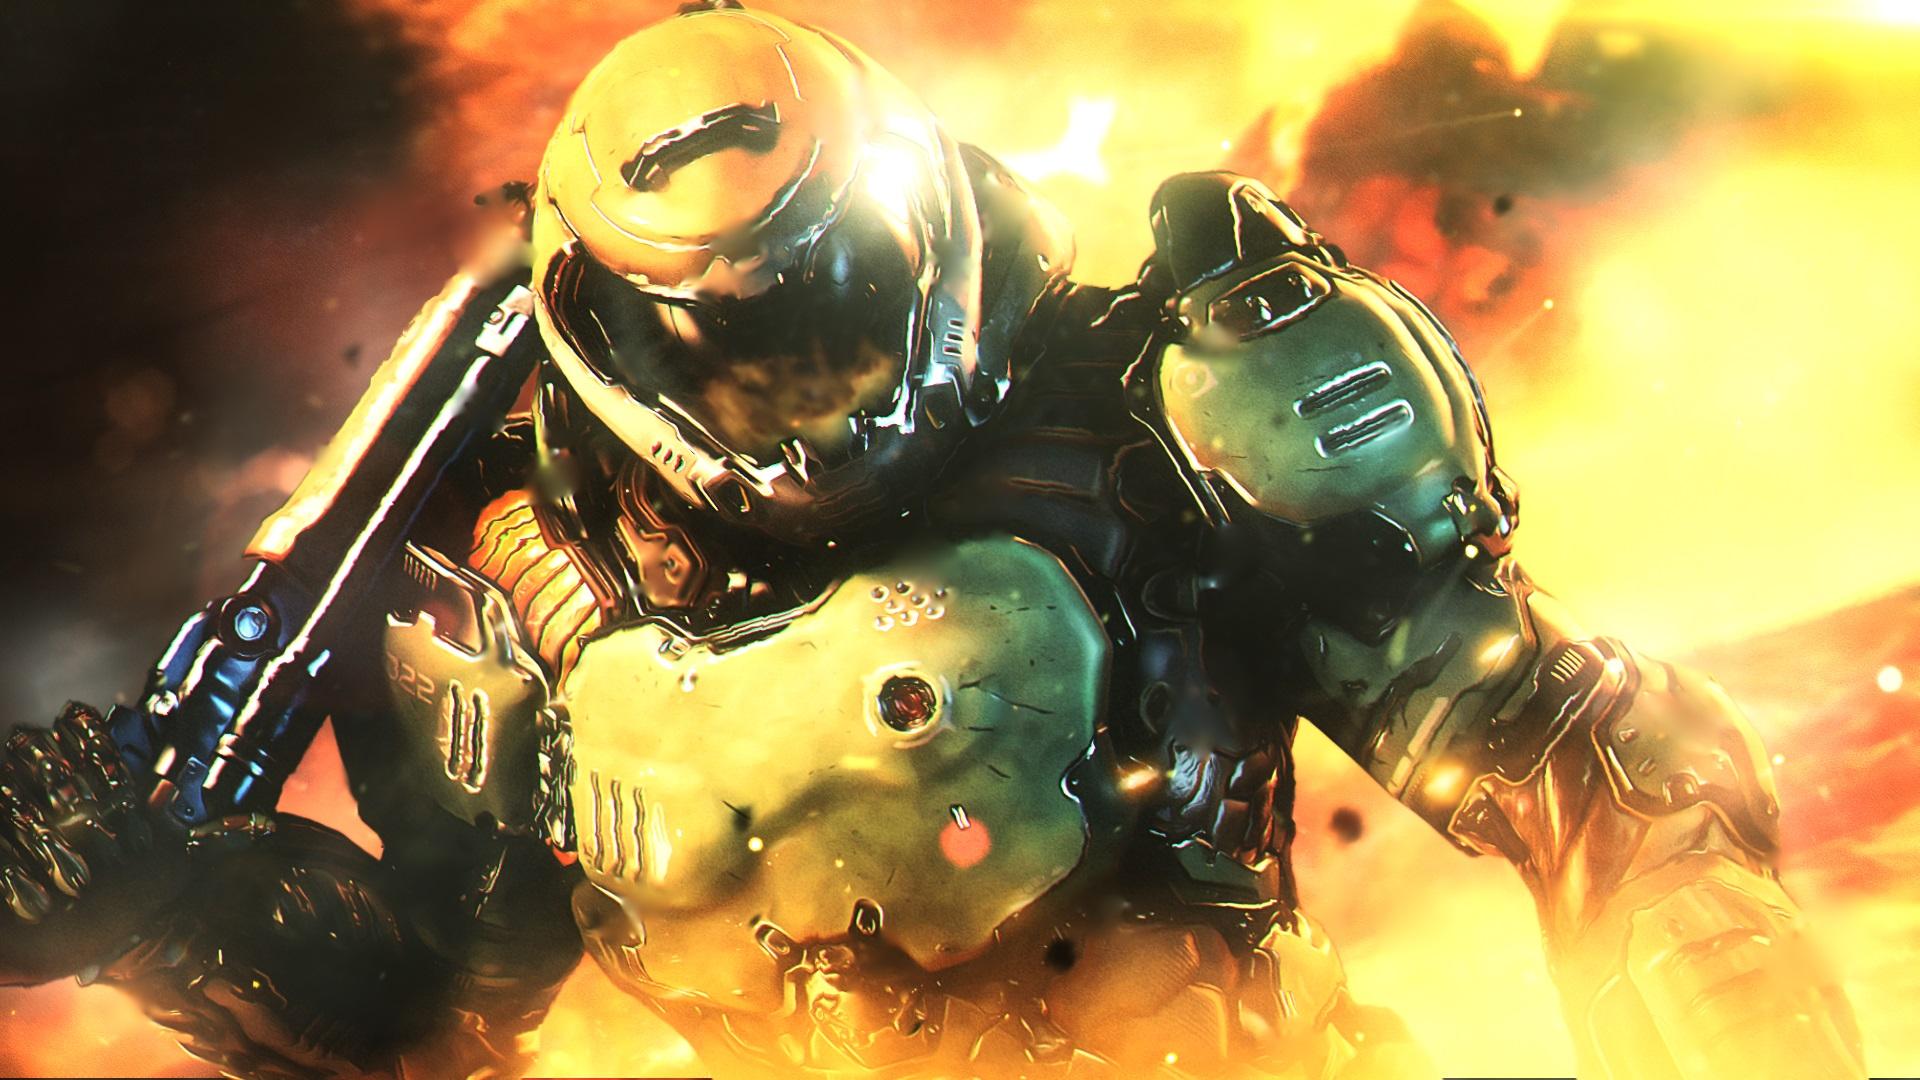 Steam Workshop Doom Slayer